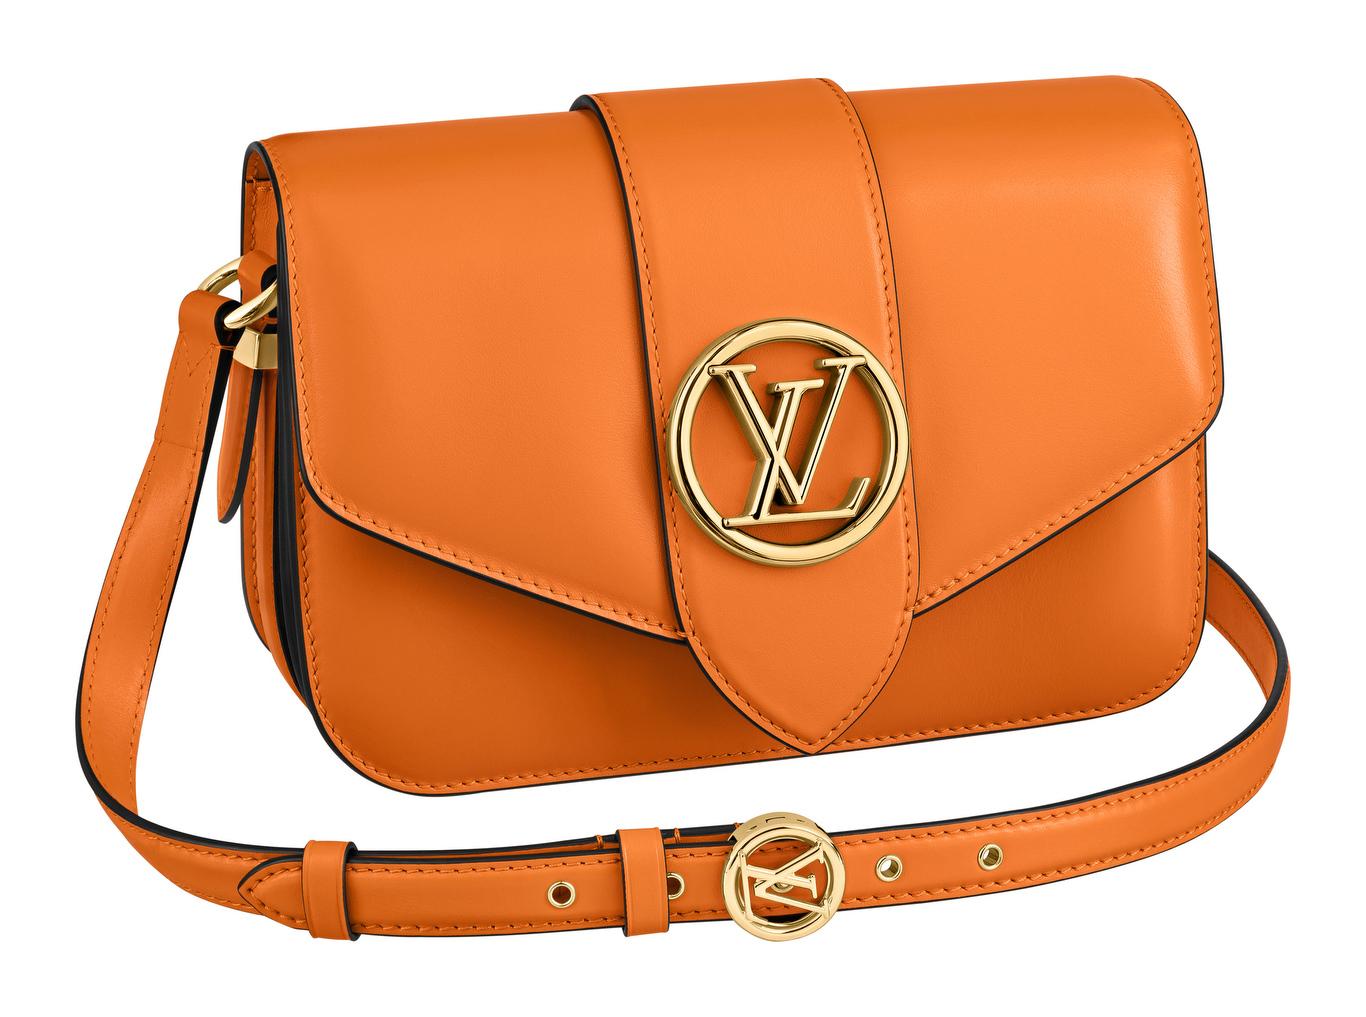 VuittonÕs new ÒPont 9Ó bag, launching this week worlwide